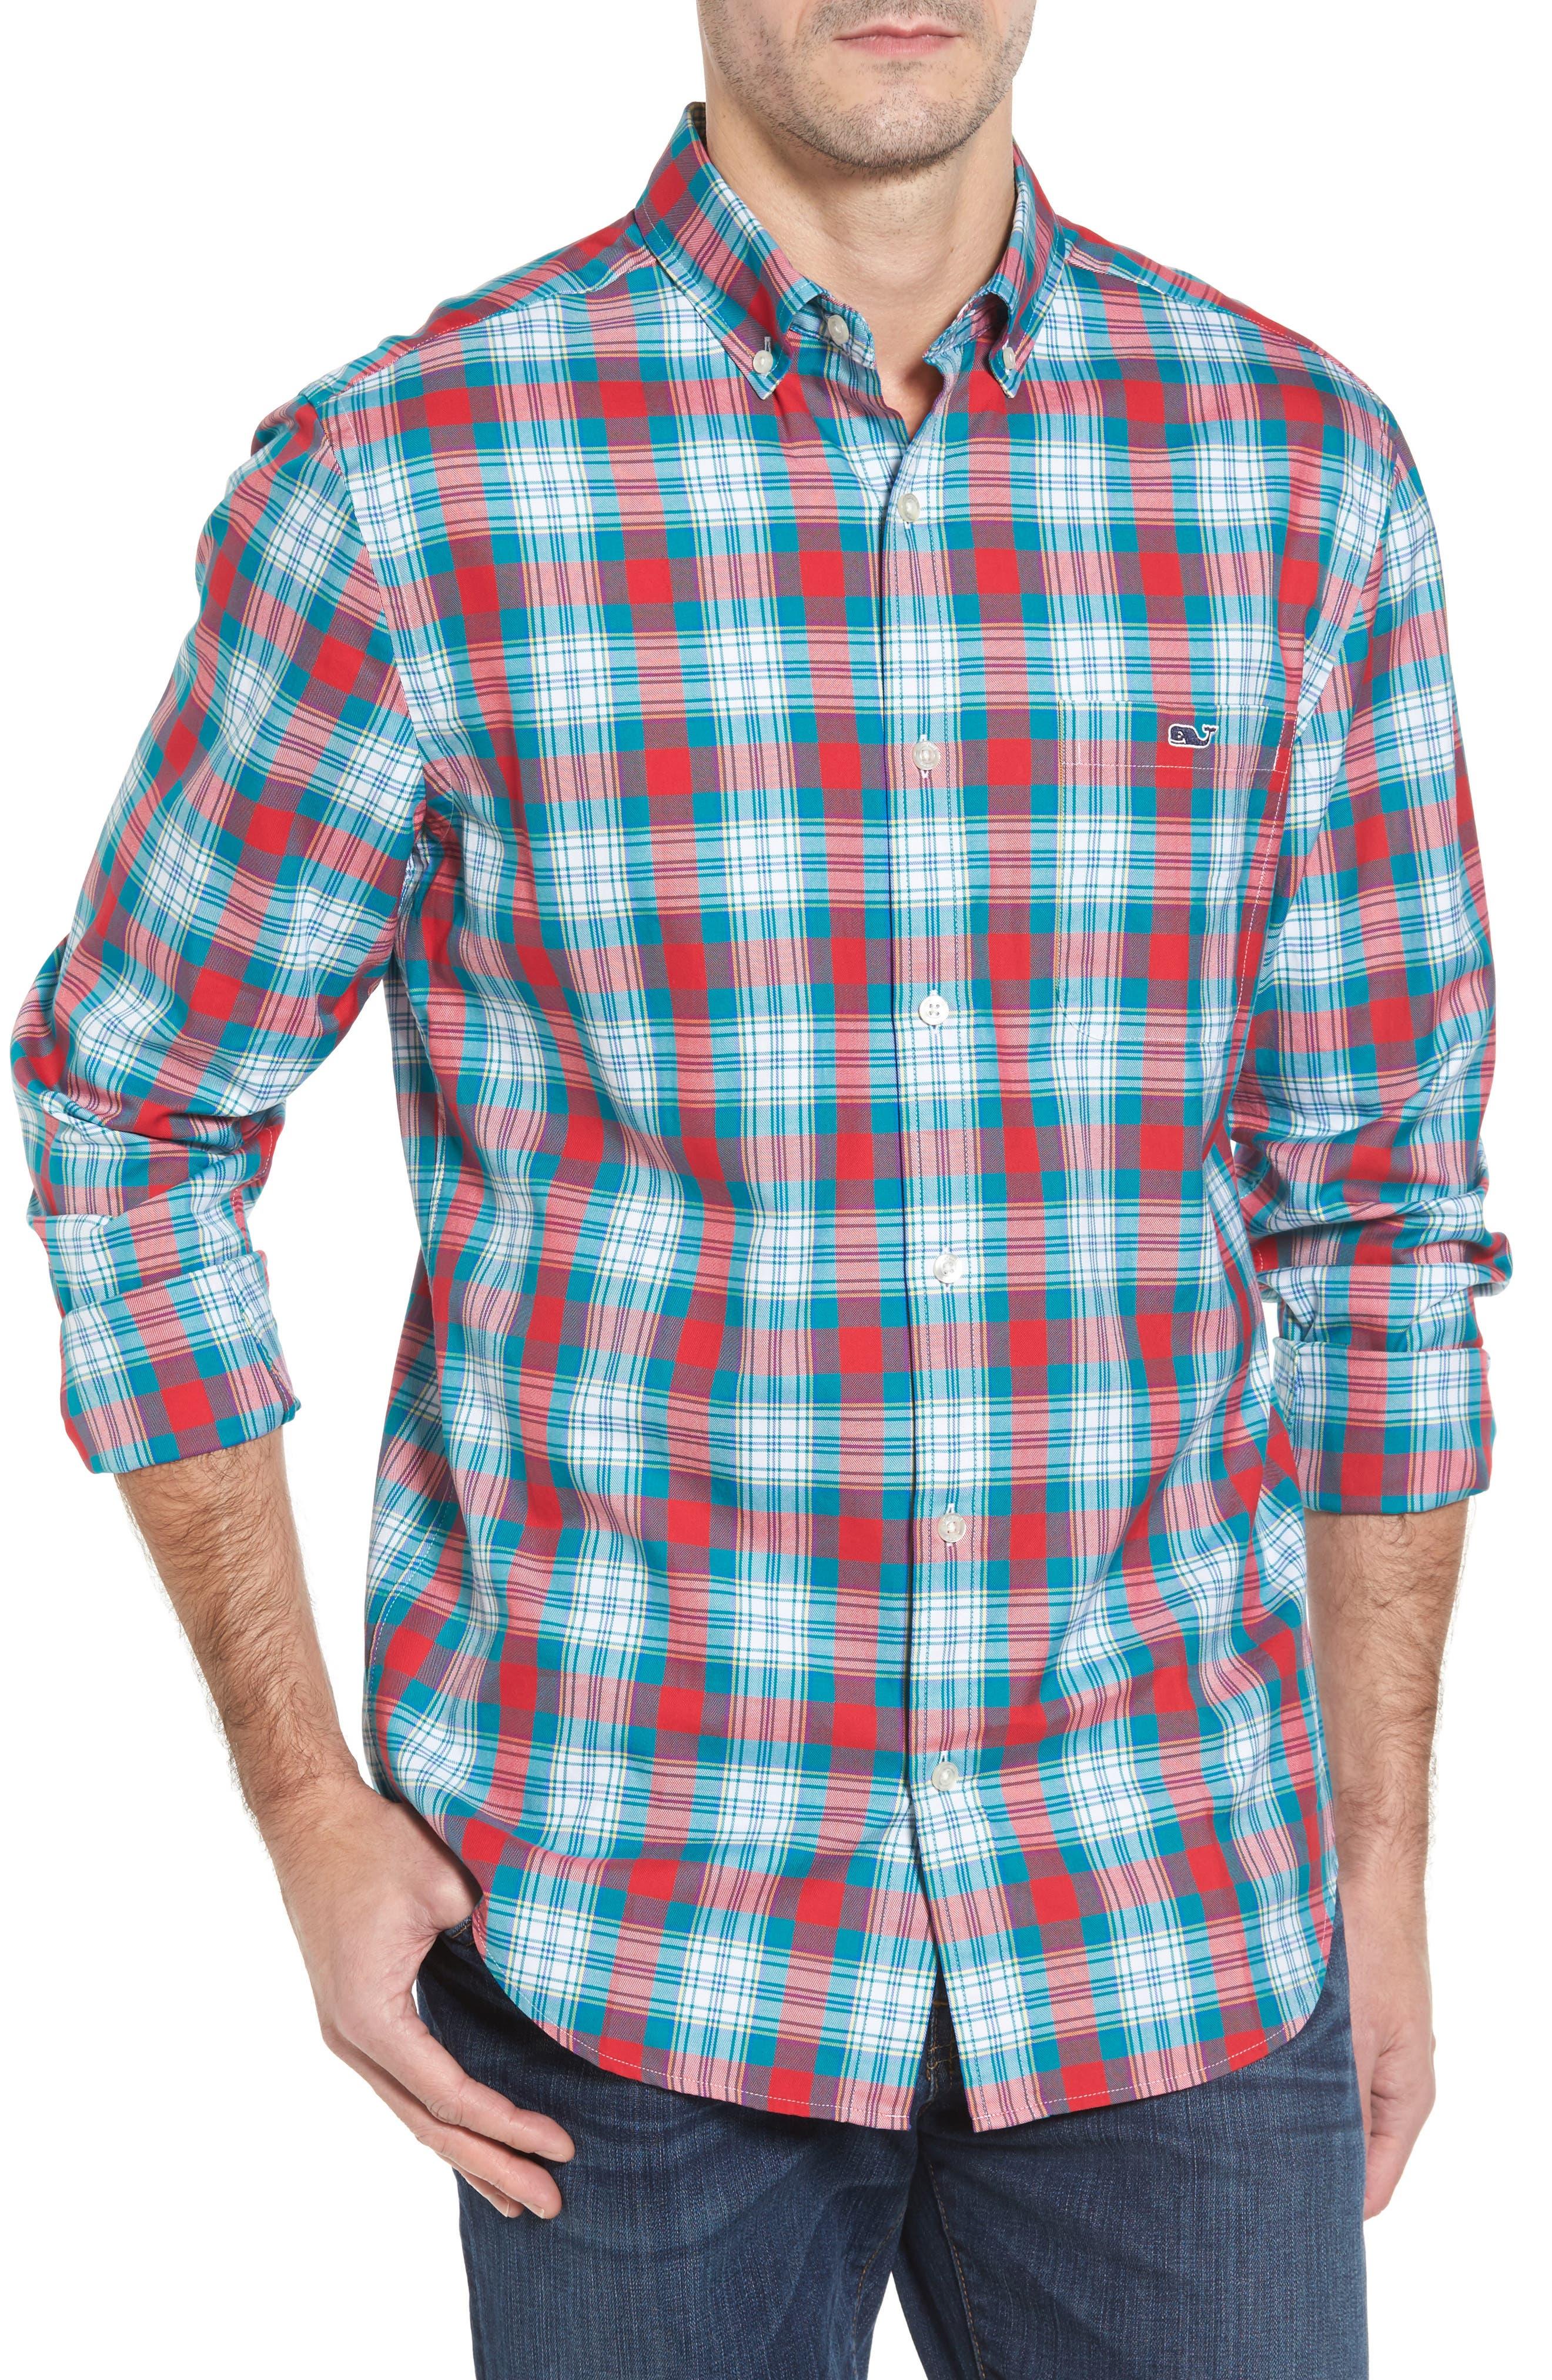 Elmwood Classic Fit Plaid Sport Shirt,                             Main thumbnail 1, color,                             351